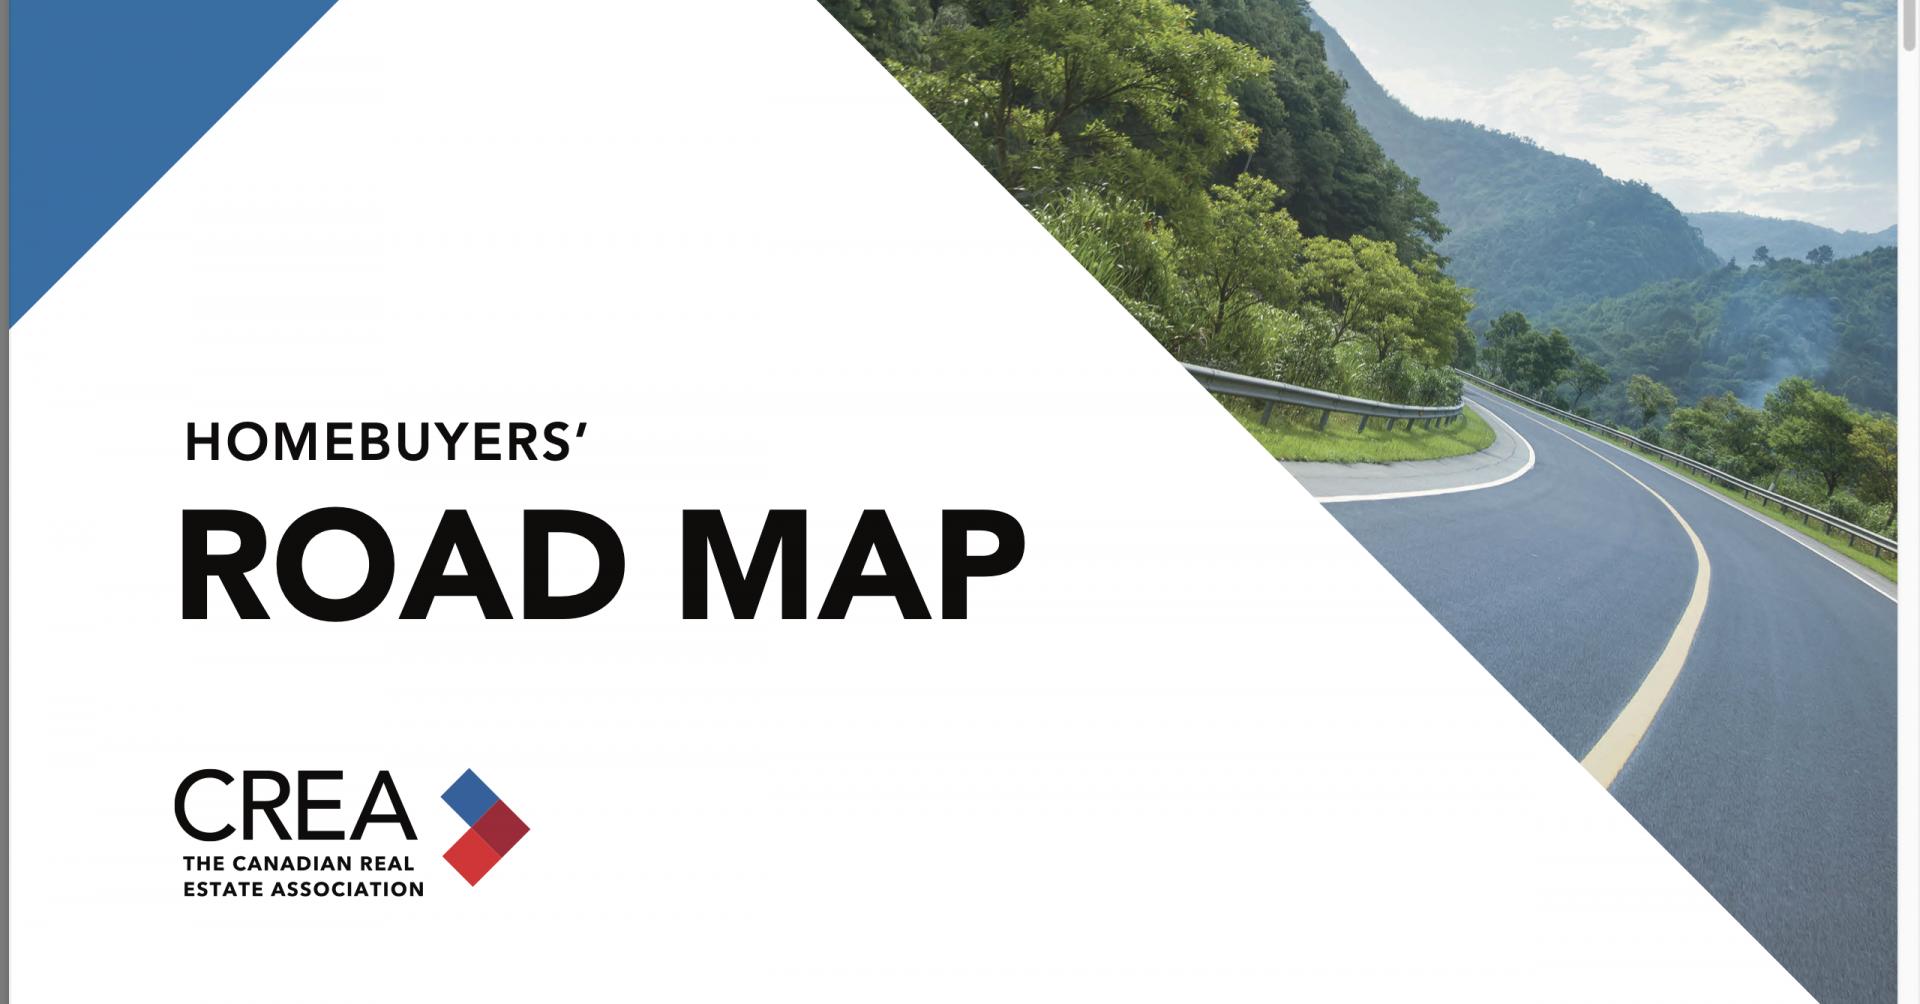 HOMEBUYERS' ROAD MAP